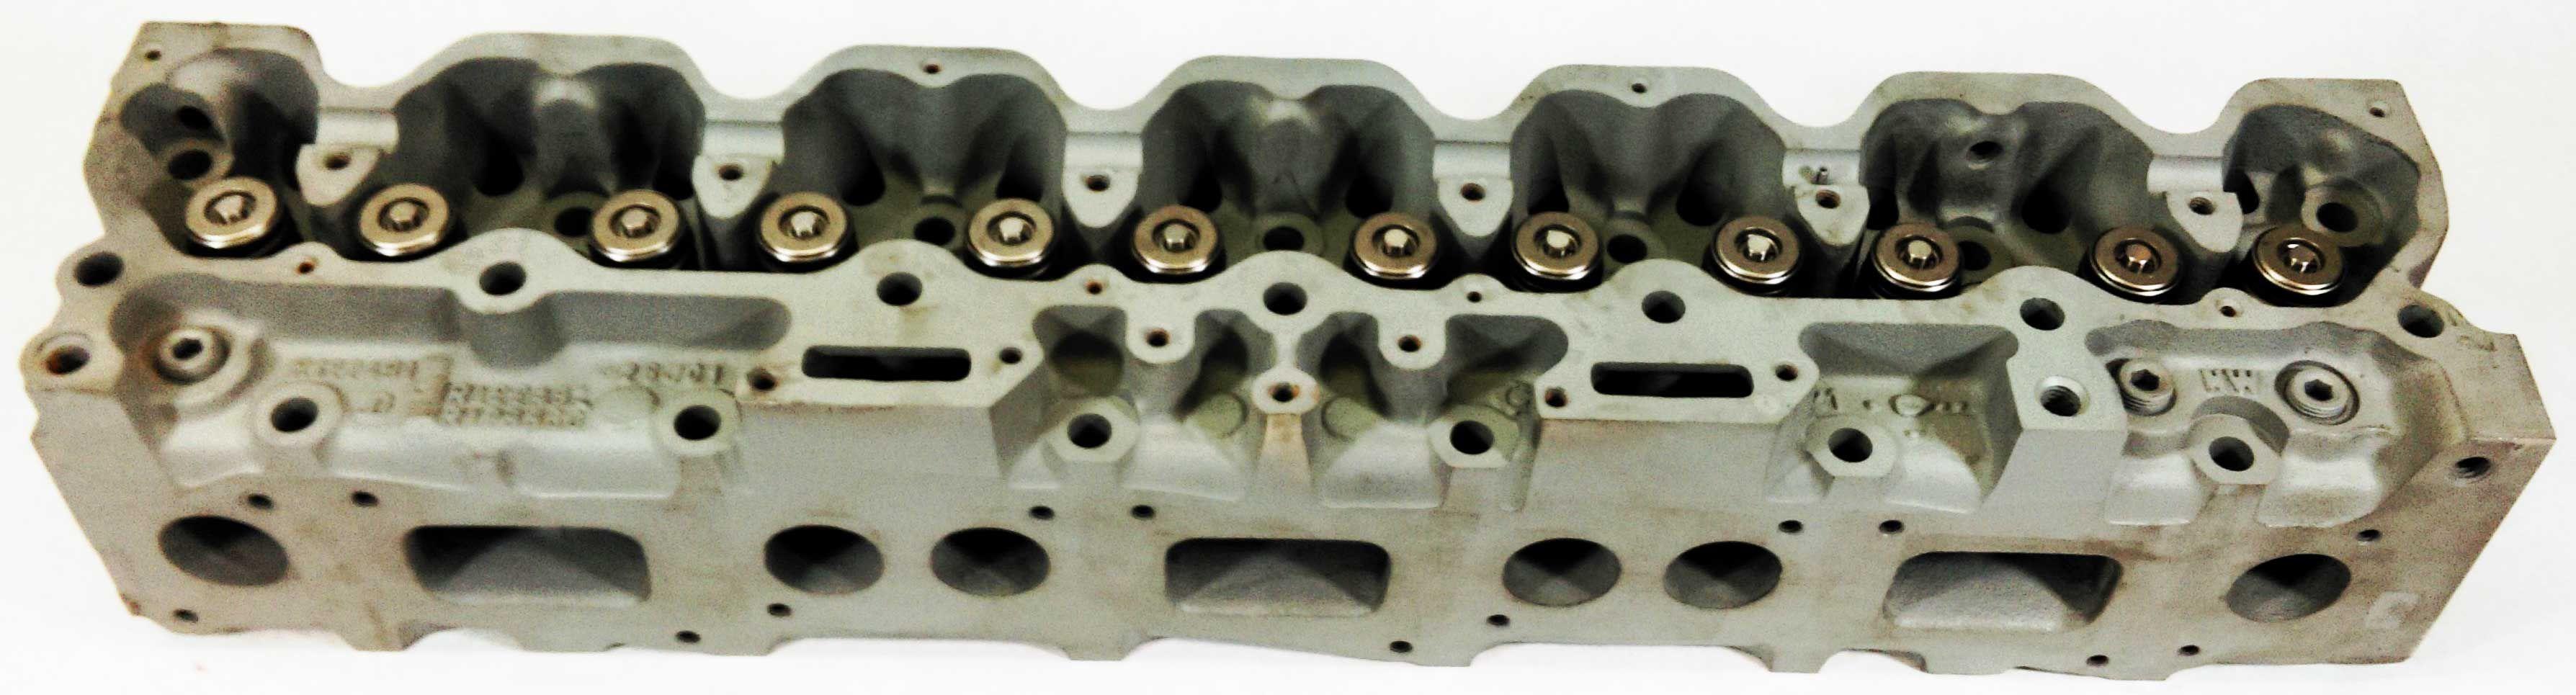 John Deere 4440 Cylinder Head : John deere jd l cylinder head remachined r